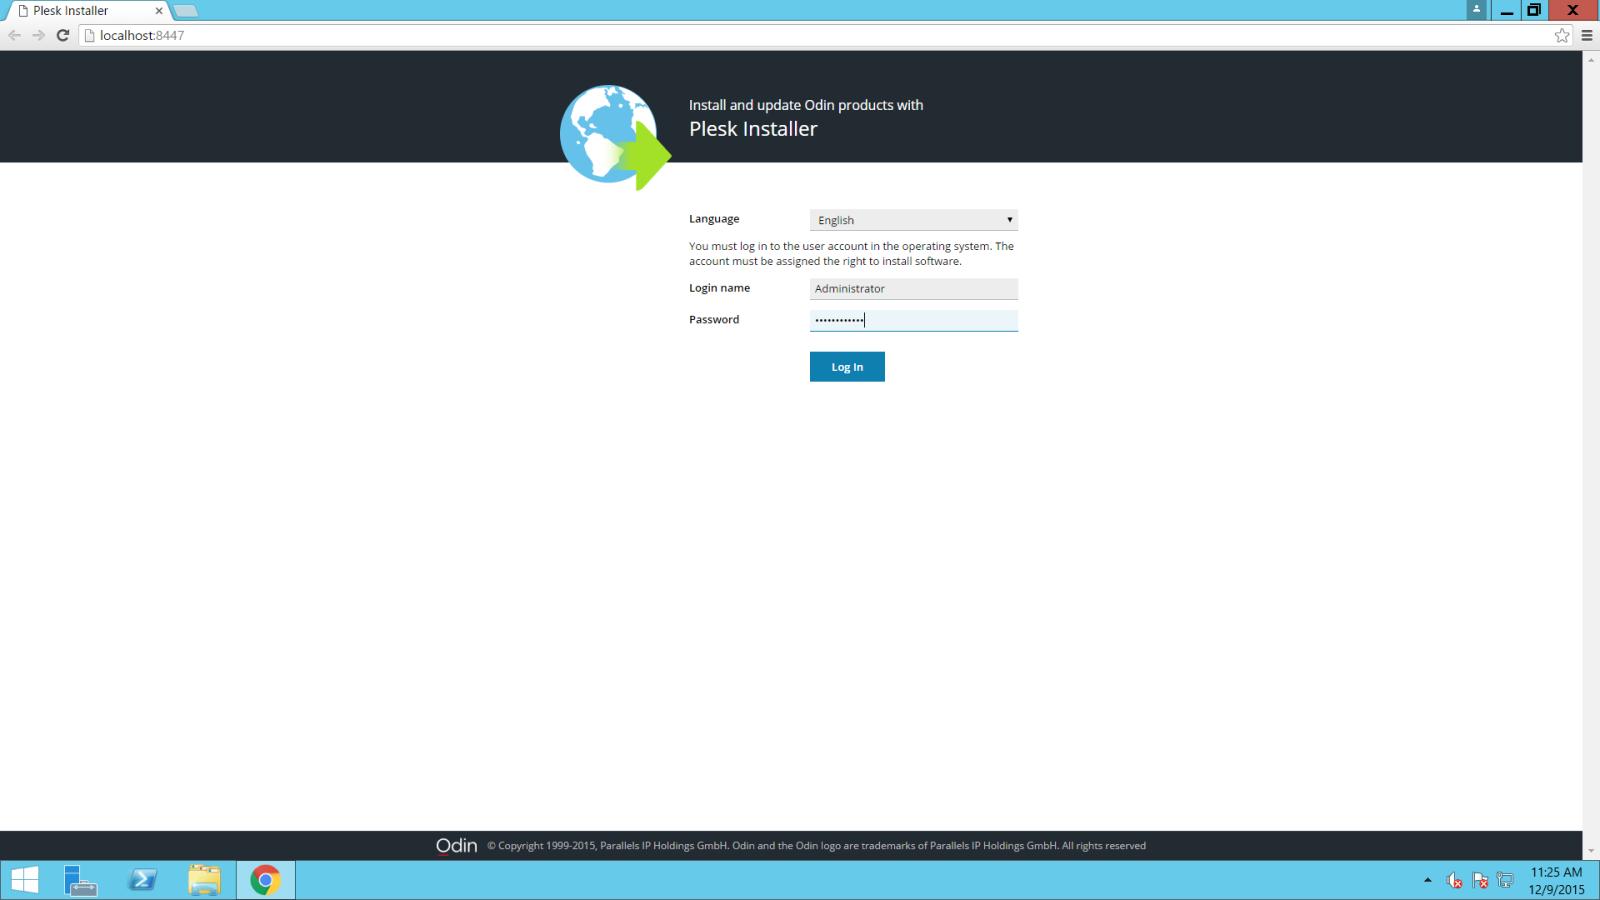 Hướng dẫn cài đặt Plesk 12 5 (Windows OS + Linux OS) - ODS